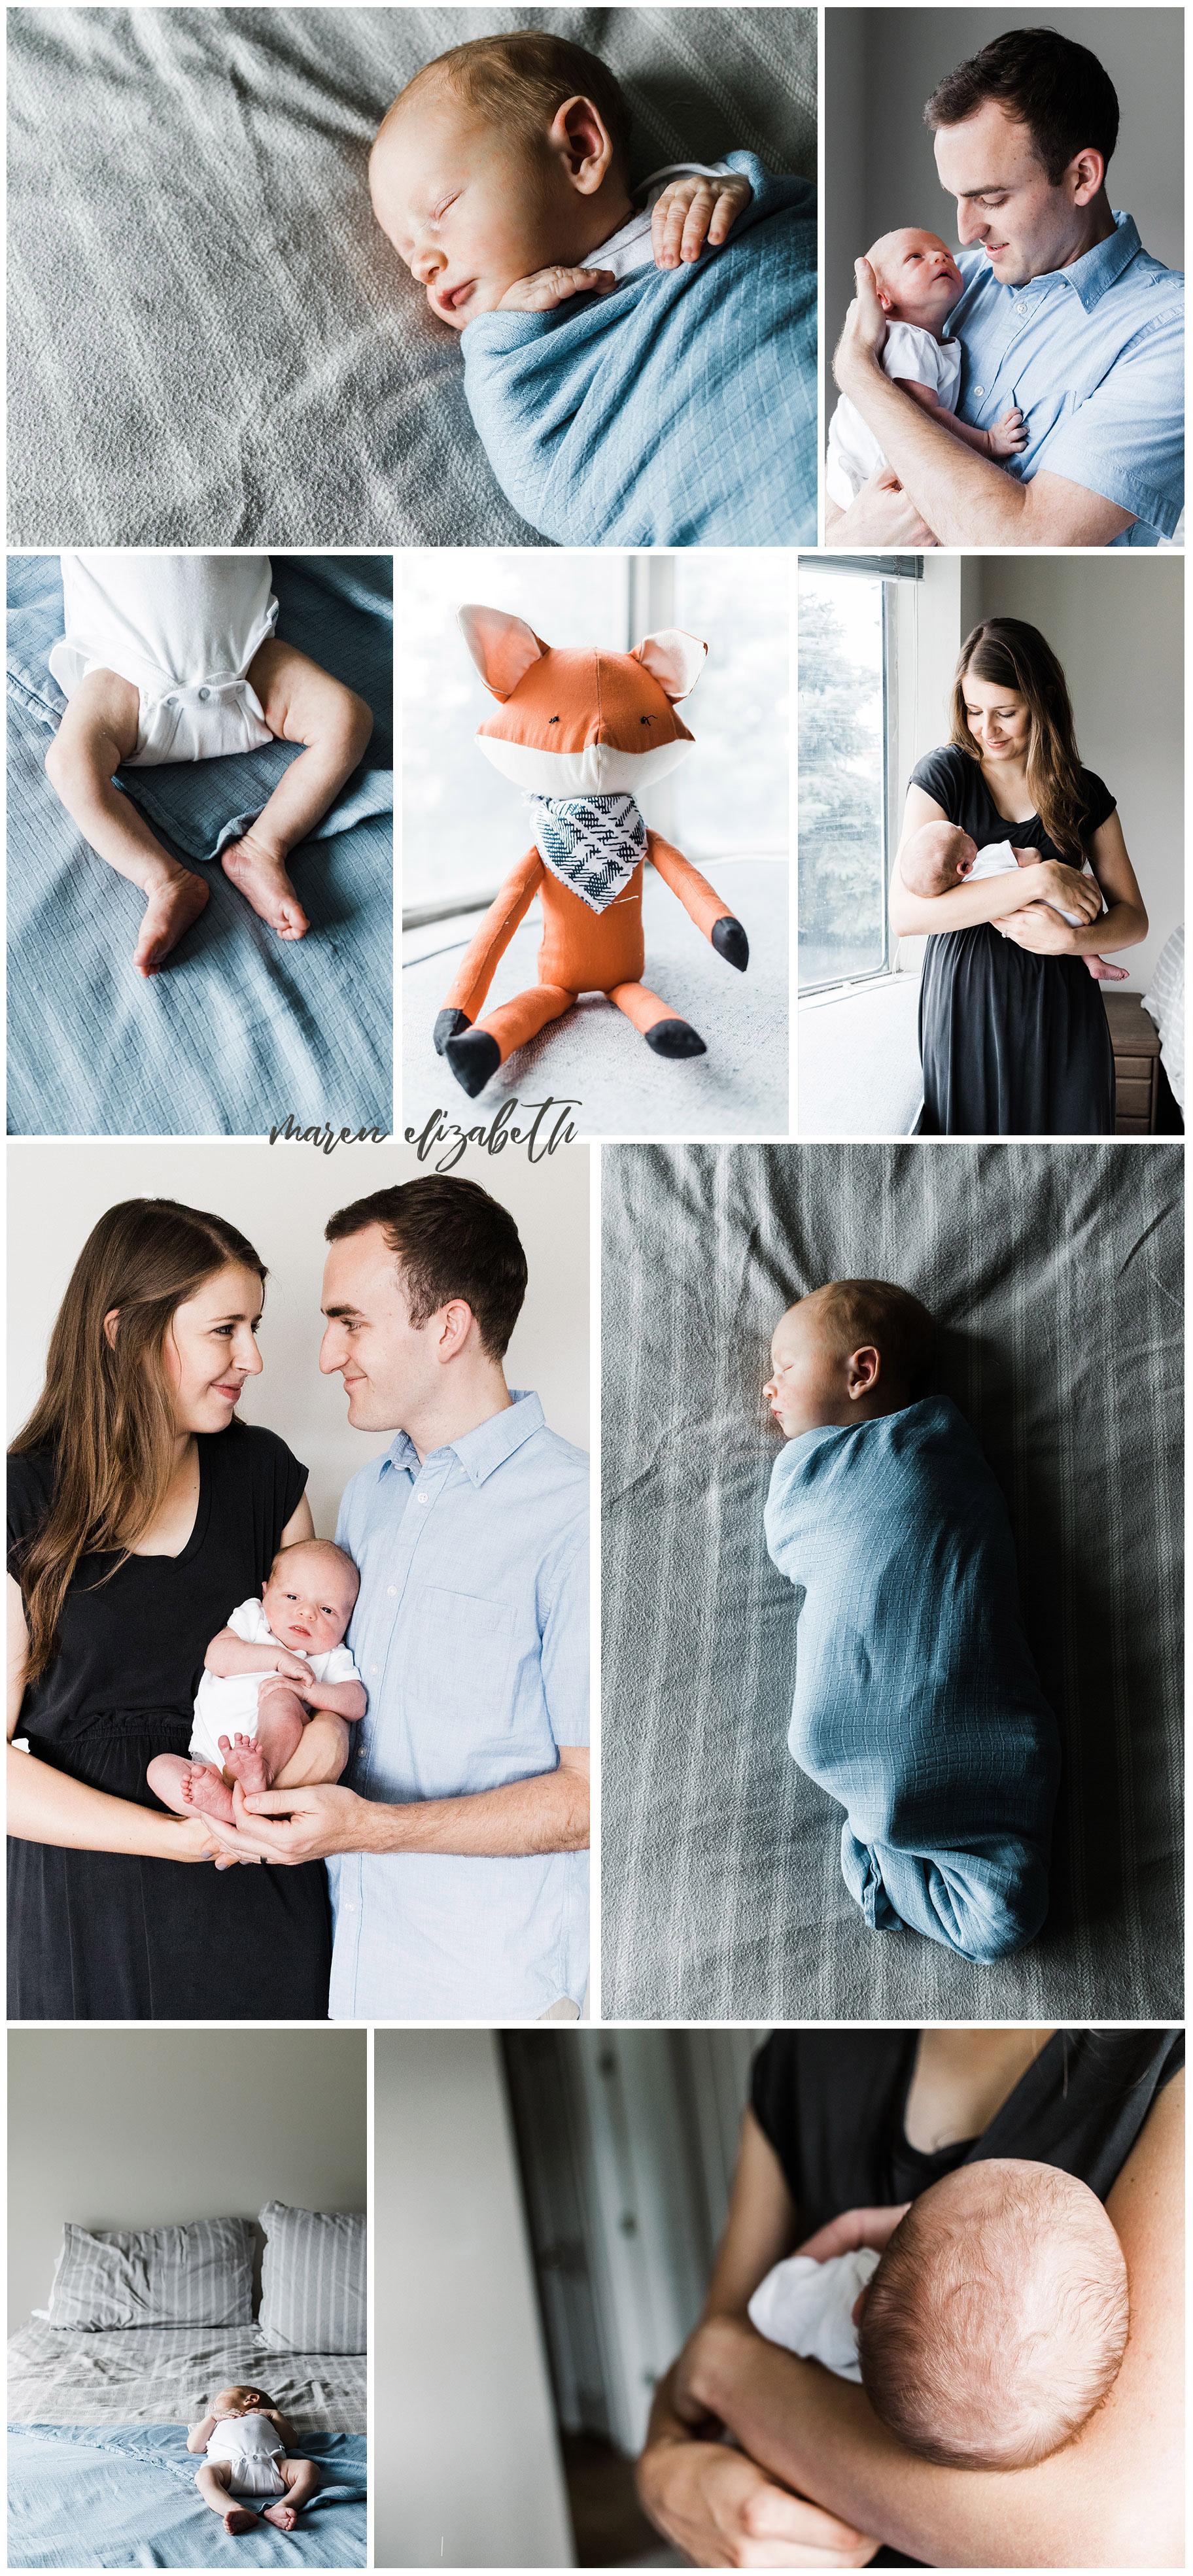 Newborn Session - In-Home Session